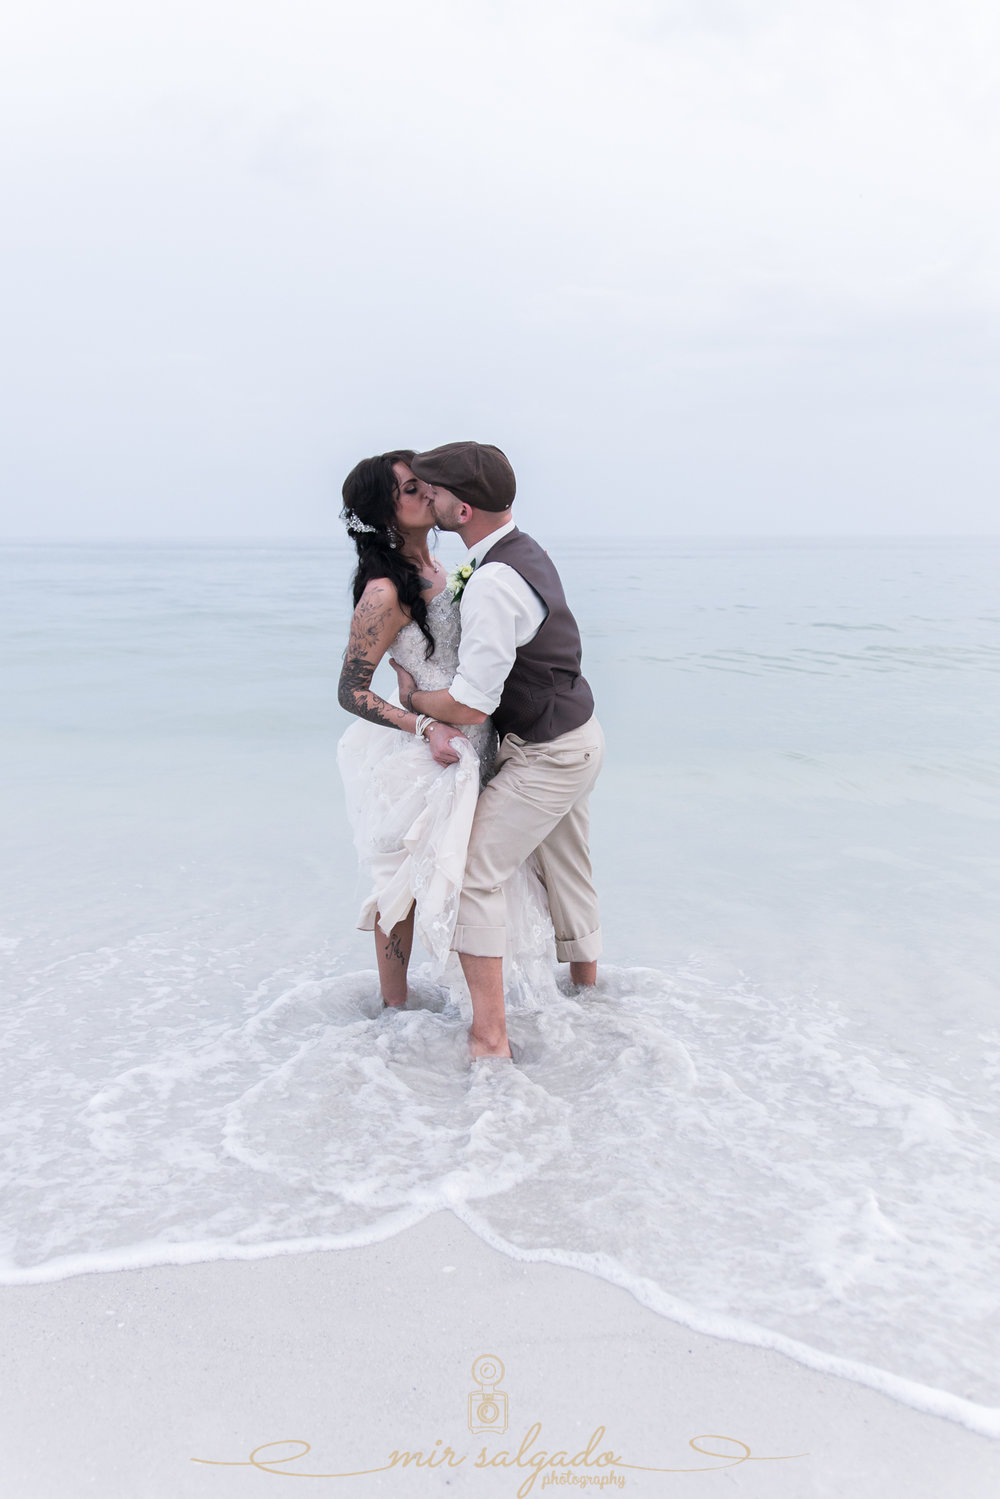 St.Pete-beach-wedding-photo, Tampa-wedding-photographer